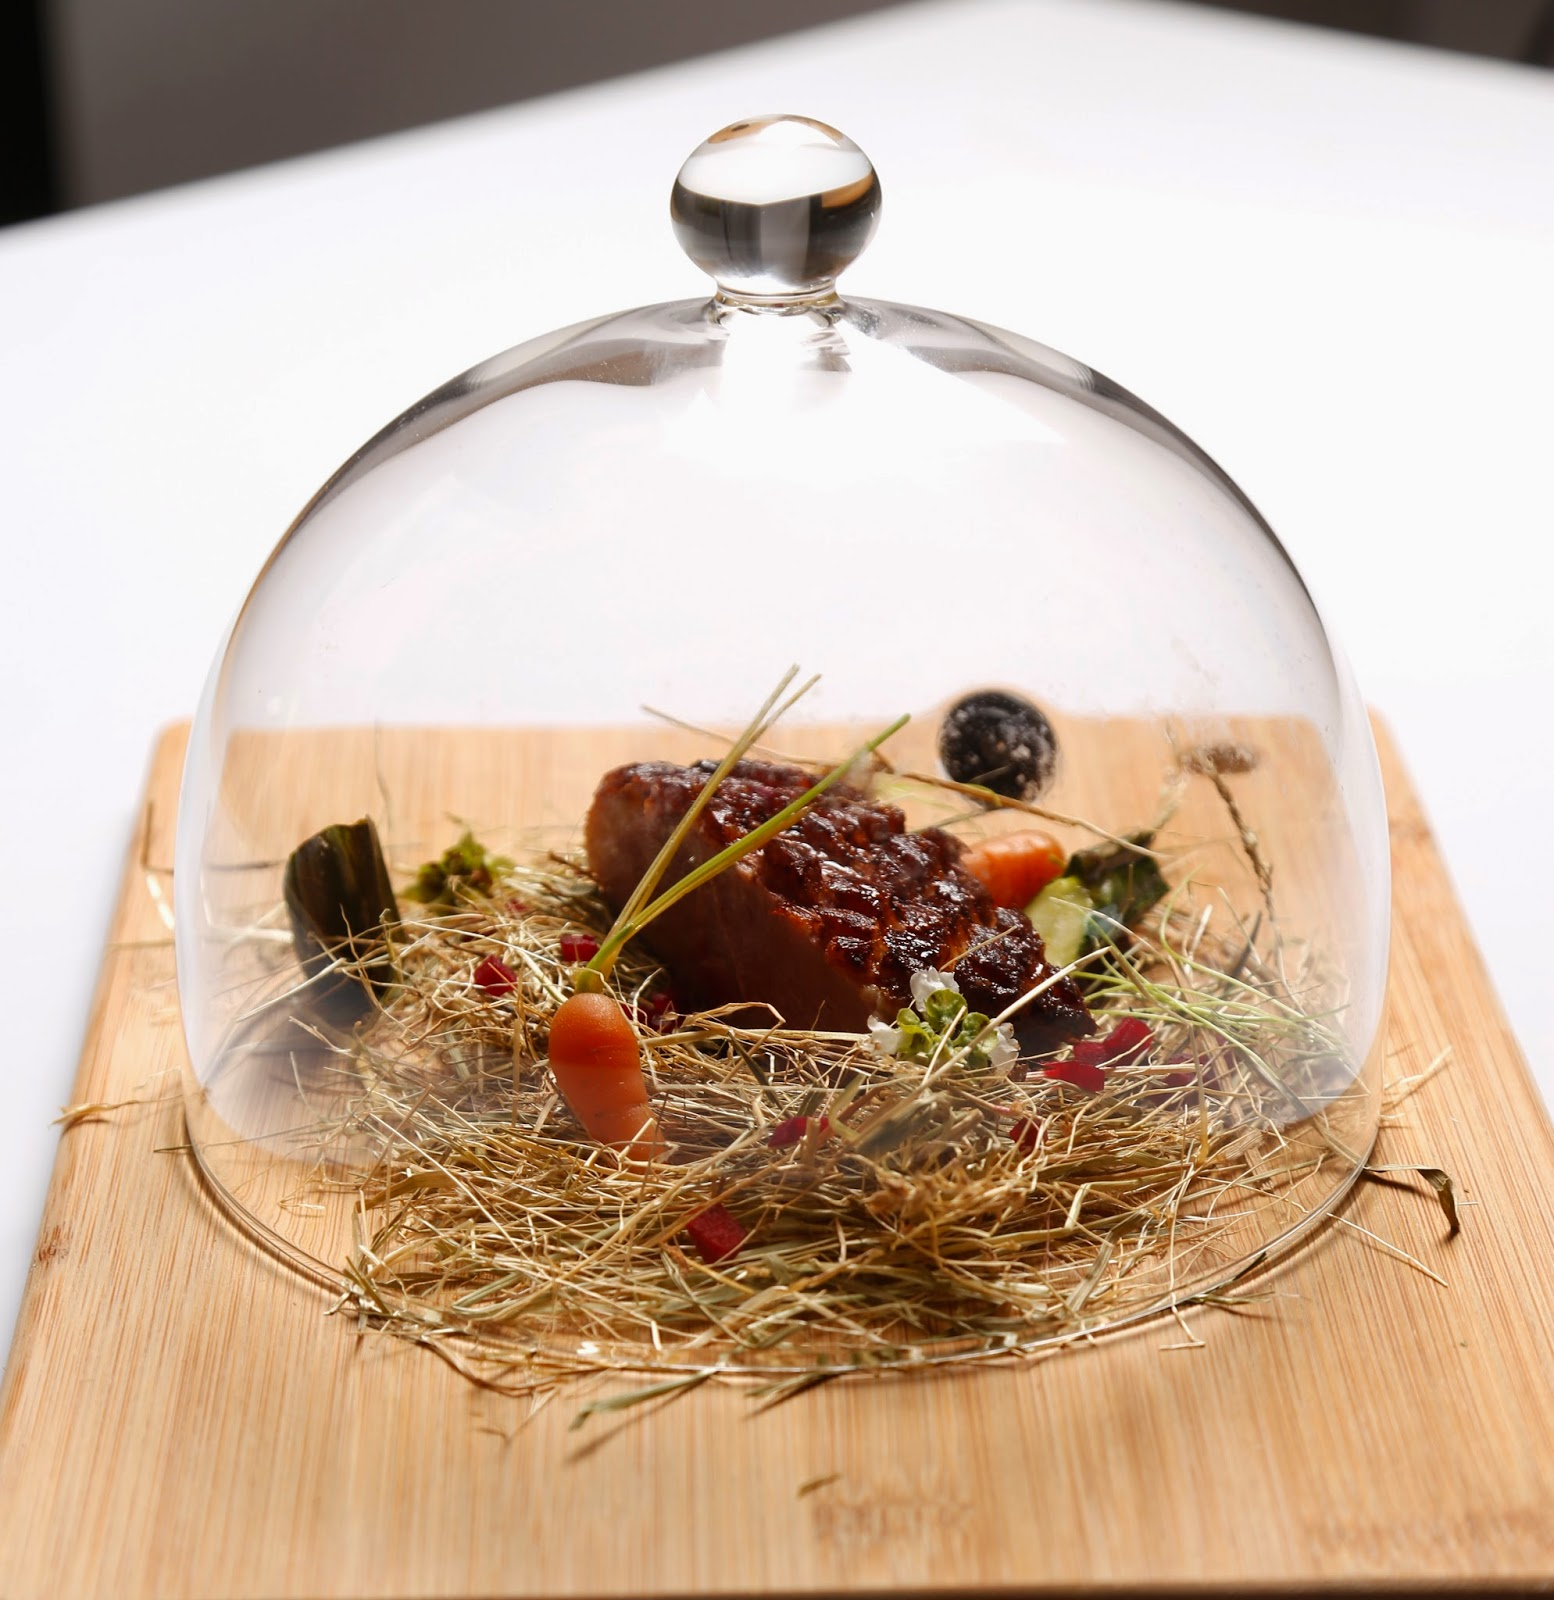 Restaurante Brel - magret de pato